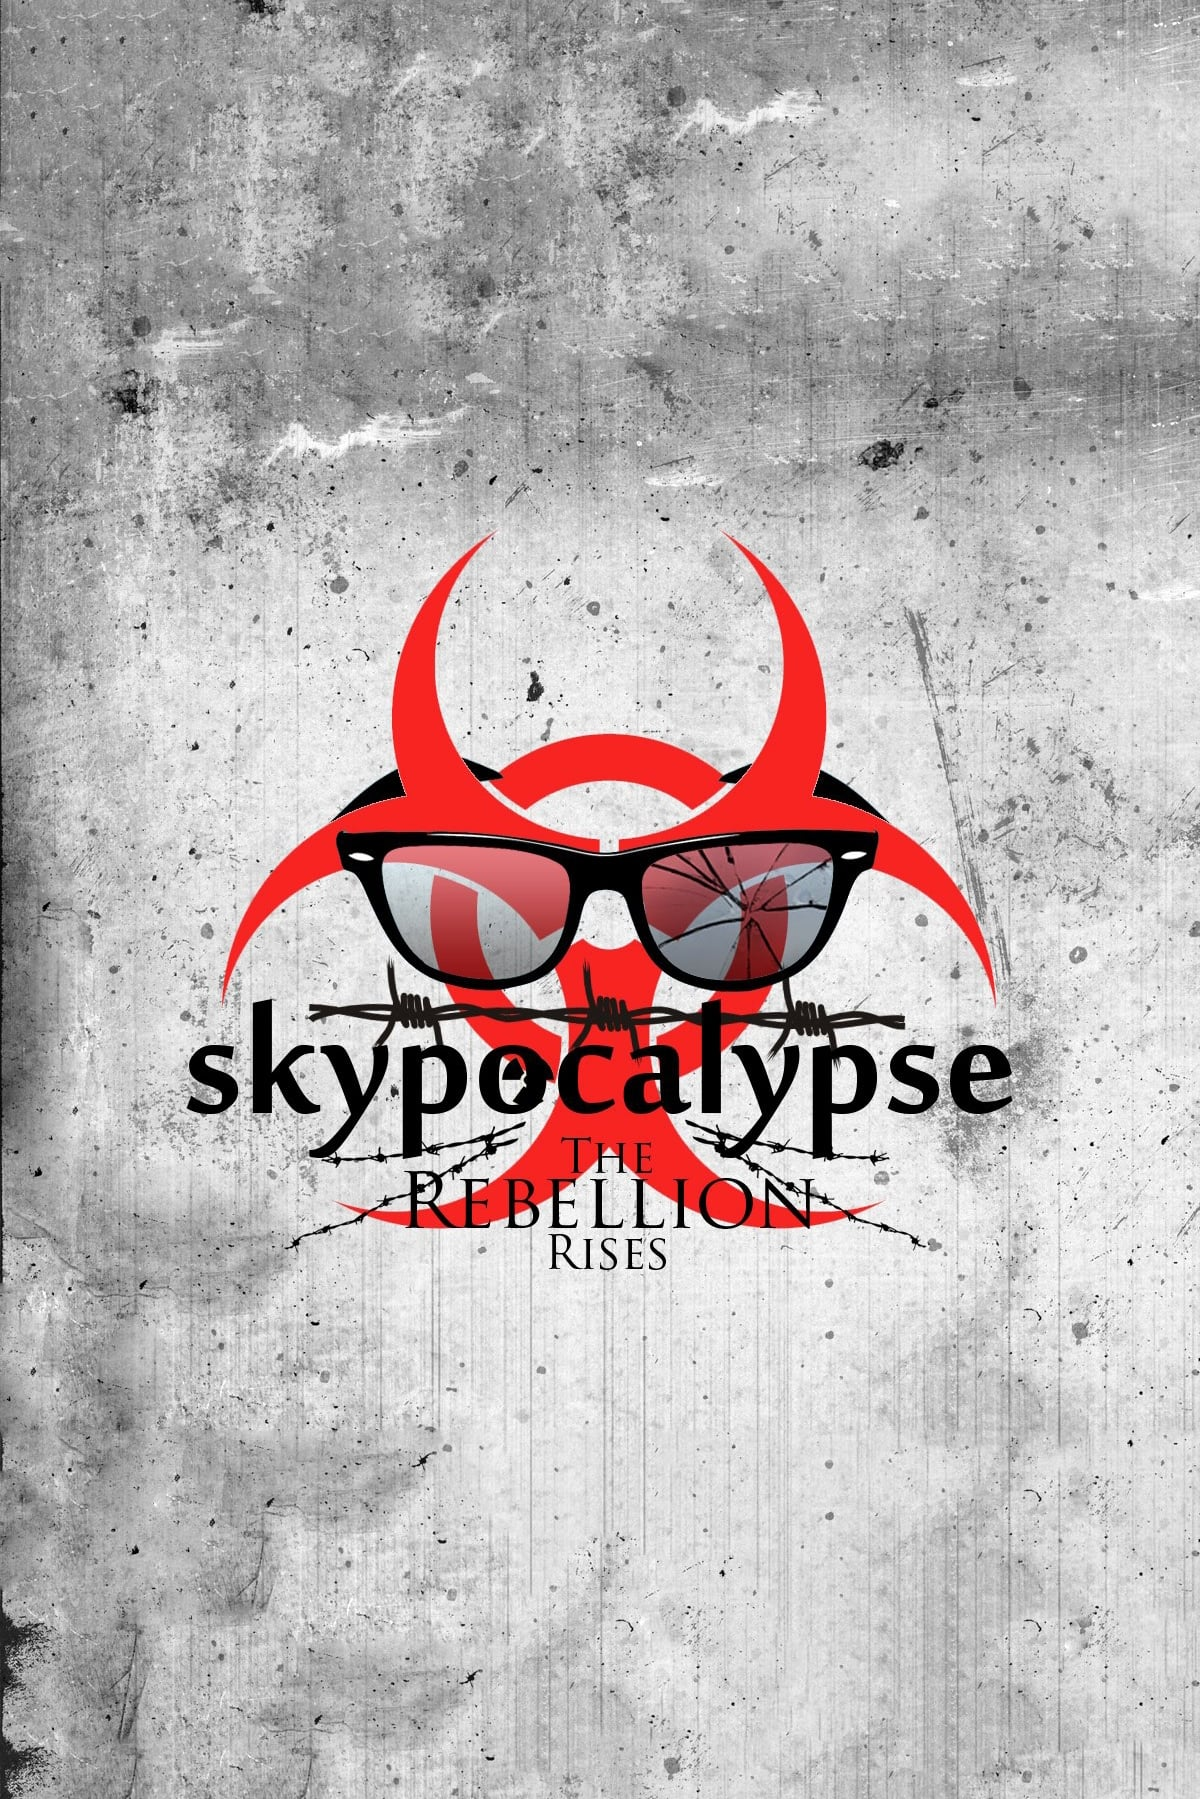 Skypocalypse TV Shows About Apocalypse